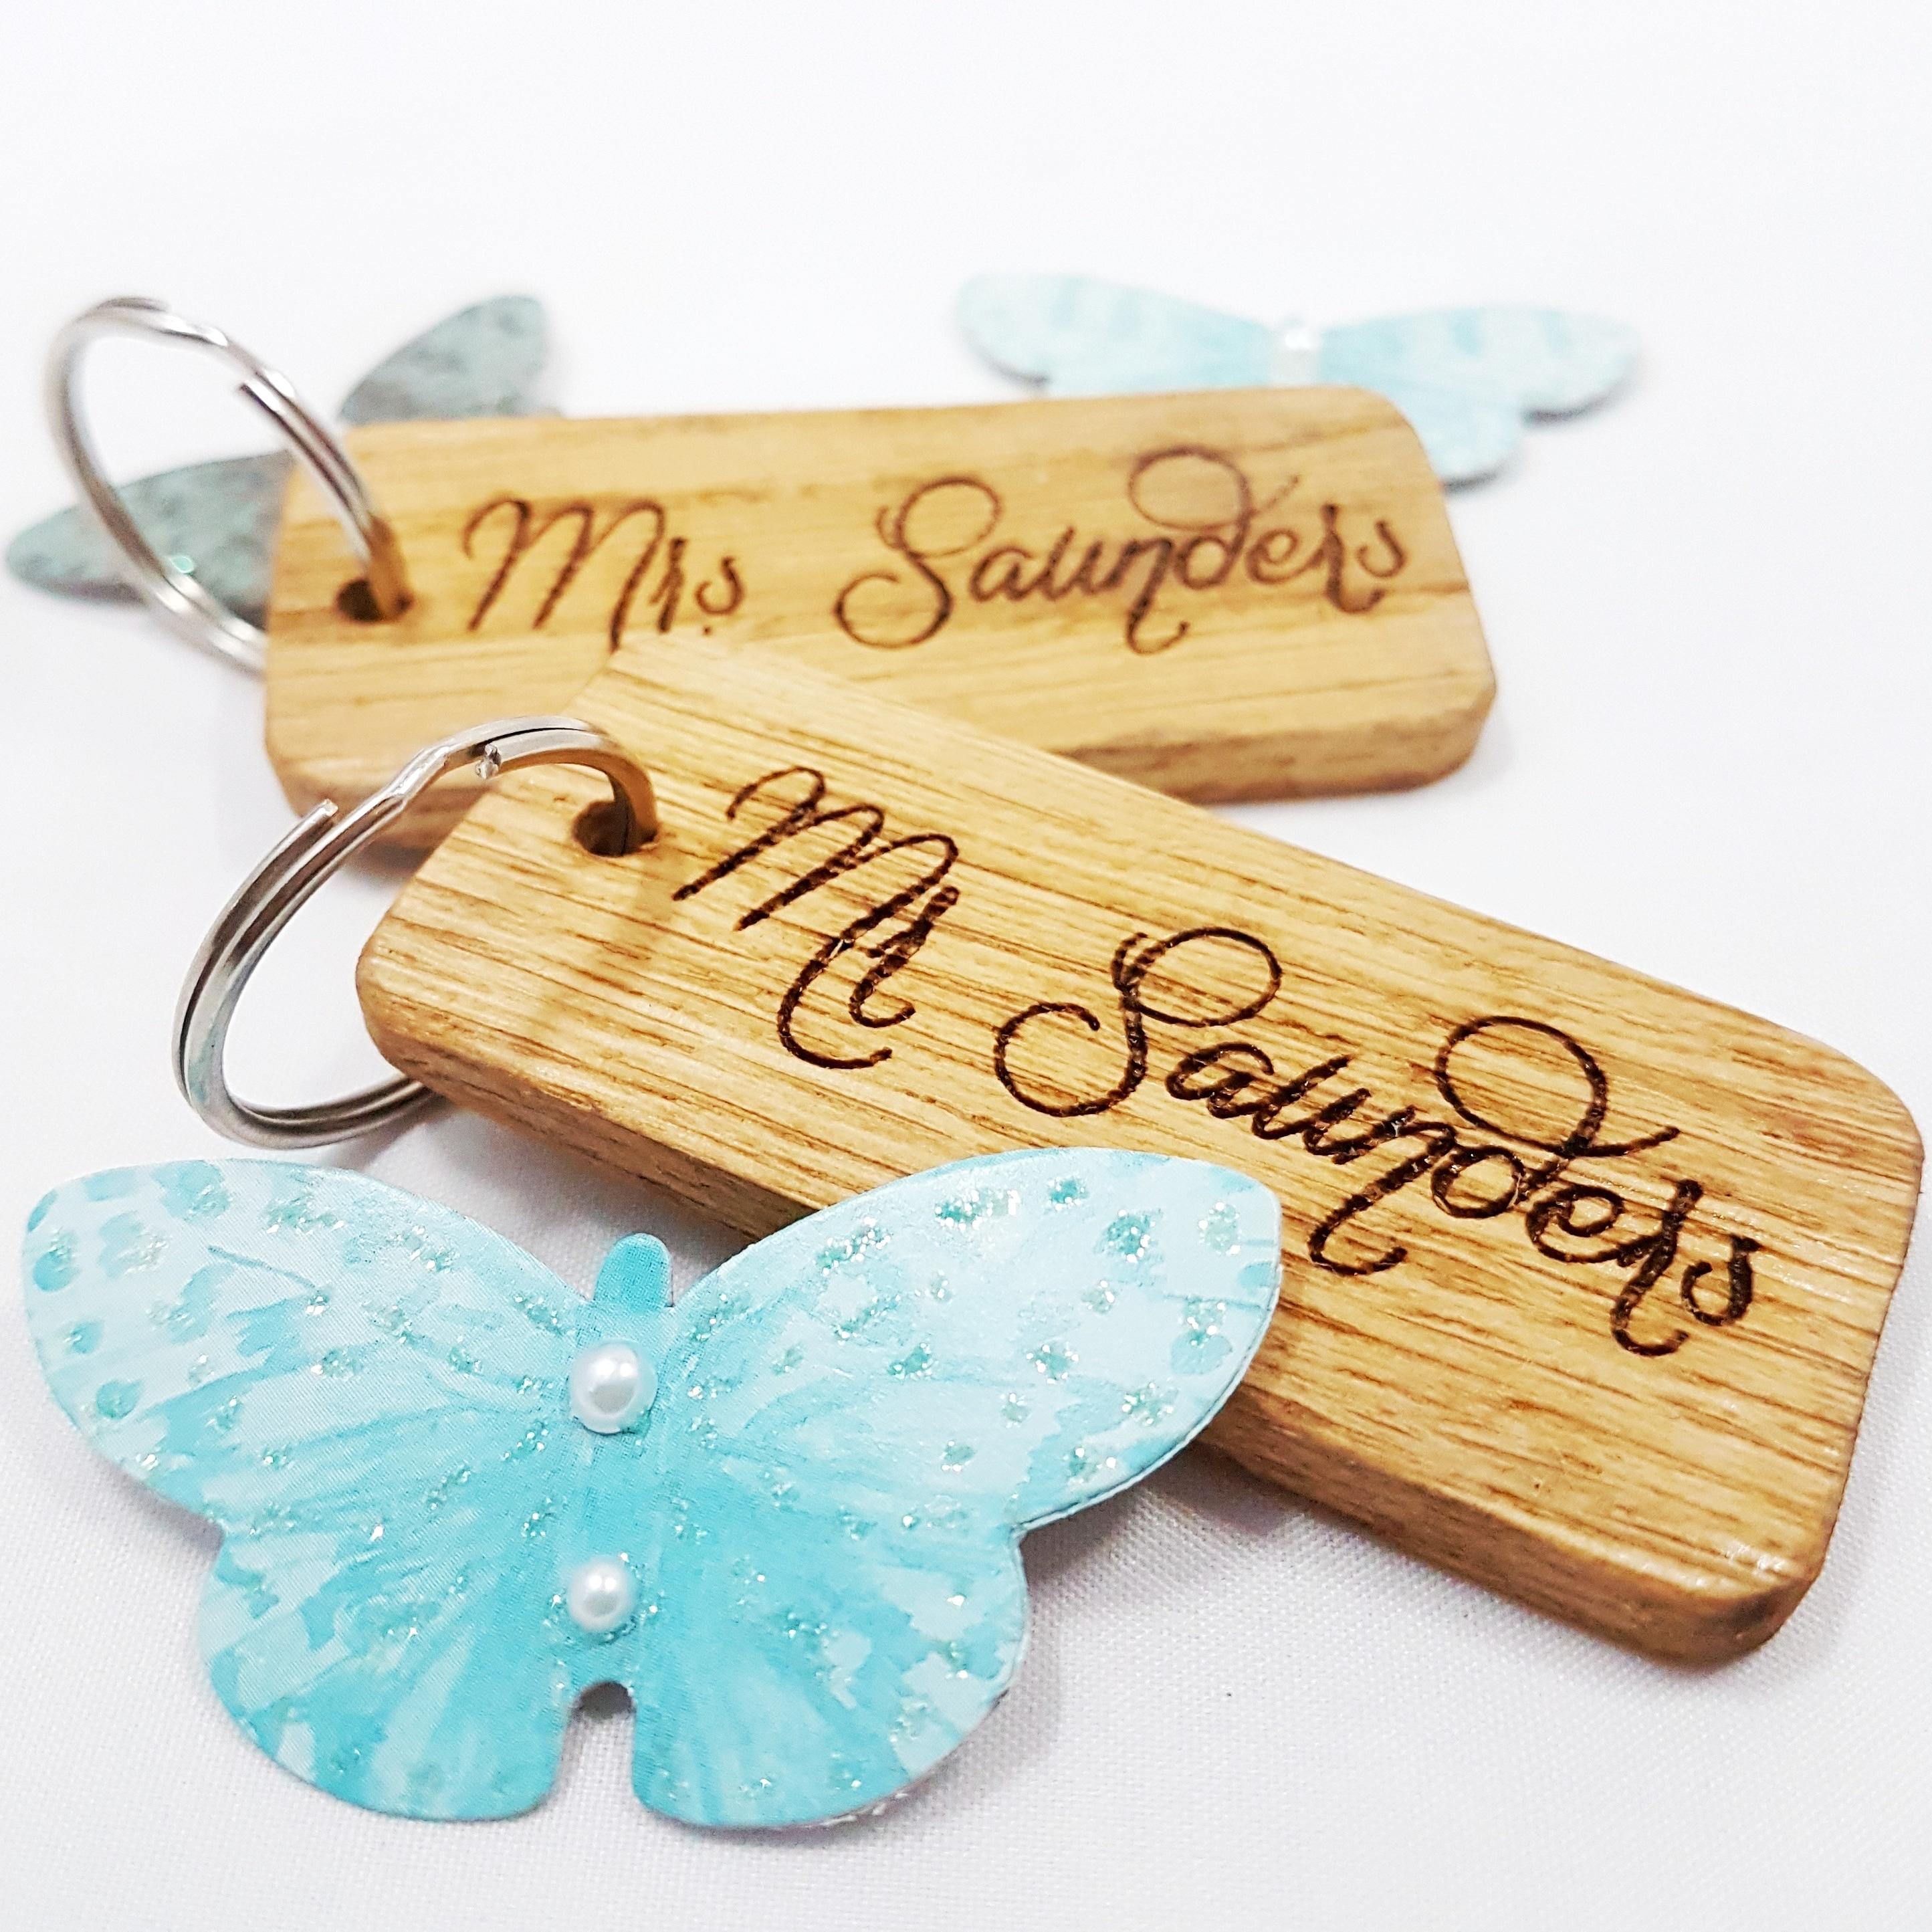 Personalised Mr & Mrs Wooden Keyring Set I Anniversary Gift Ideas I Make Memento